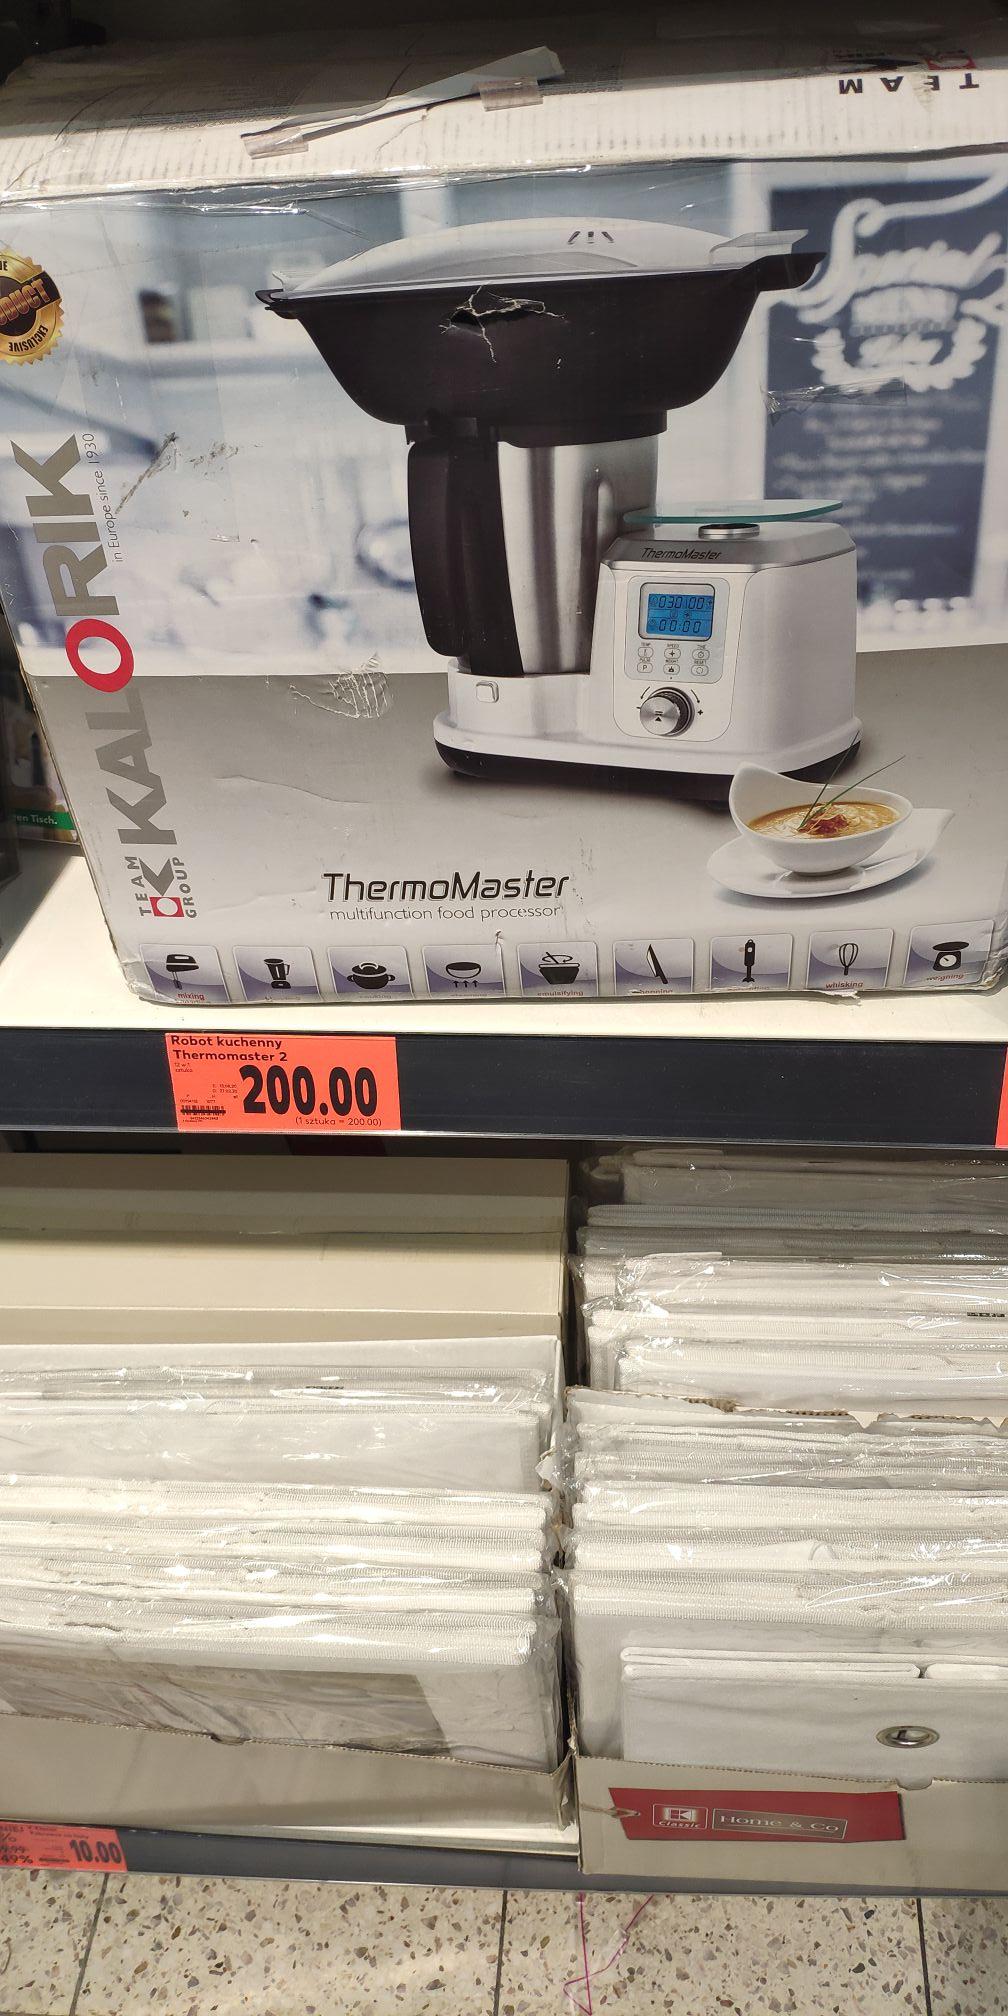 Robot kuchenny Thermomaster 2 Kalorik @Kaufland